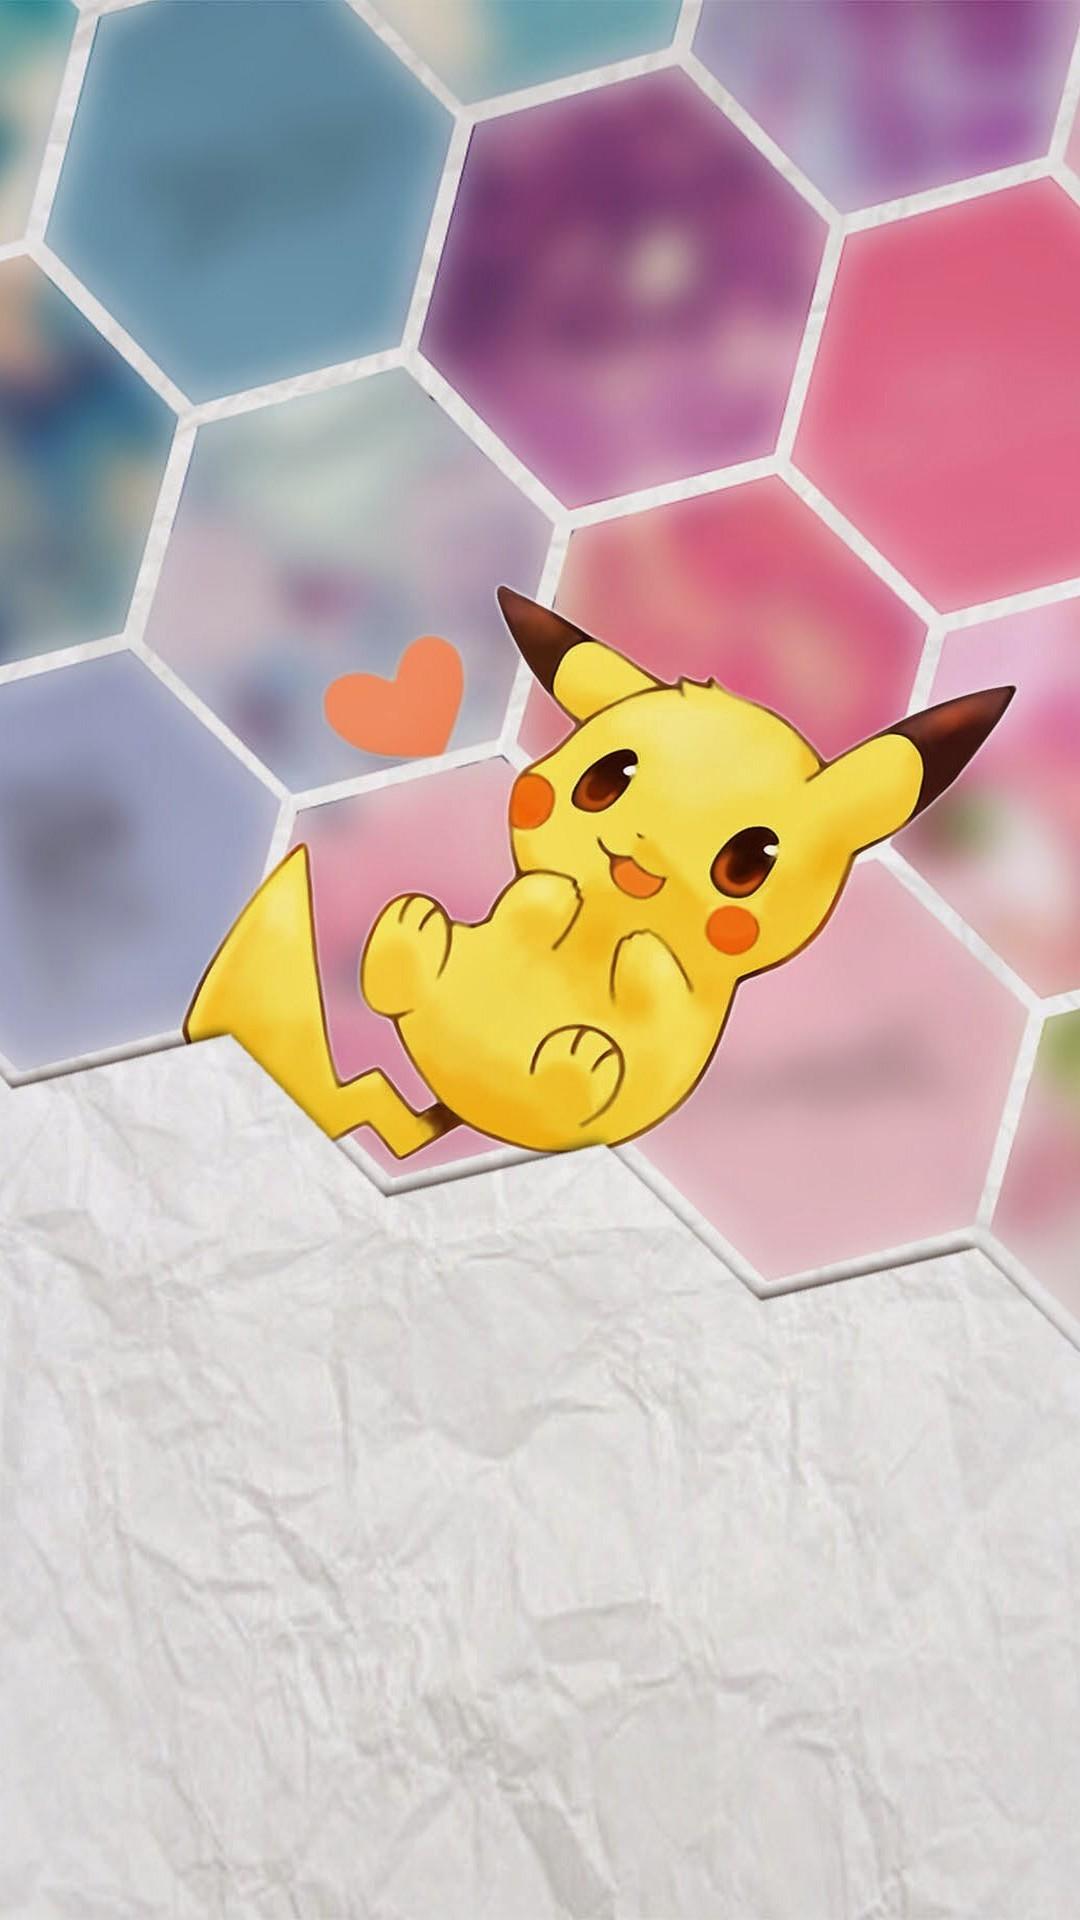 Animal crossing · Tap image for more iPhone 6 Plus Pikachu wallpapers!  Pikachu – @mobile9   Cute